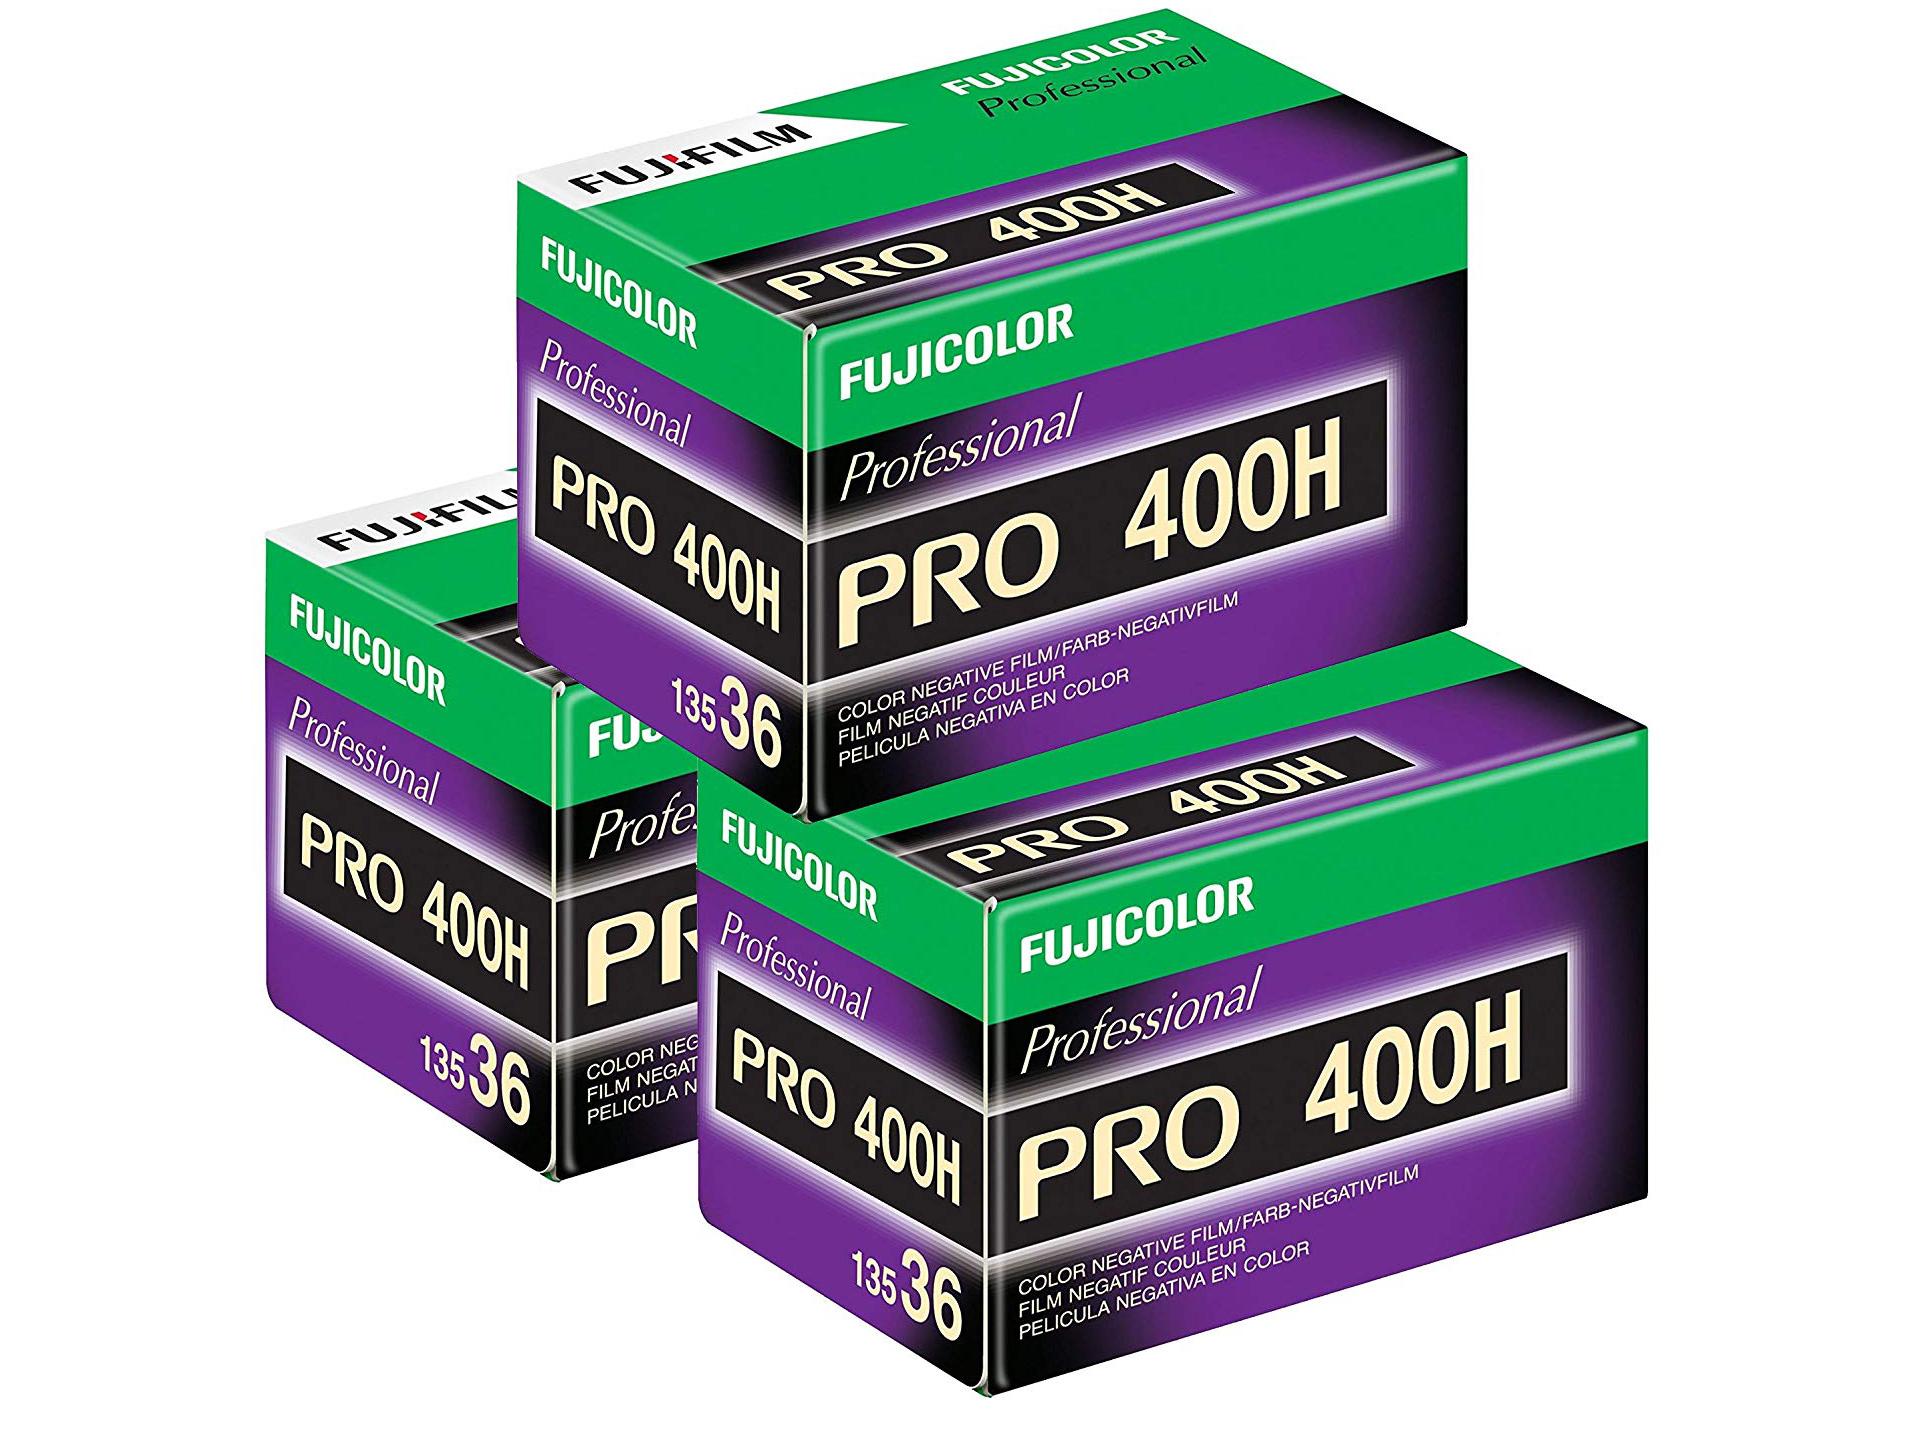 Fujifilm Japan to increase color film prices by 30%: Digital